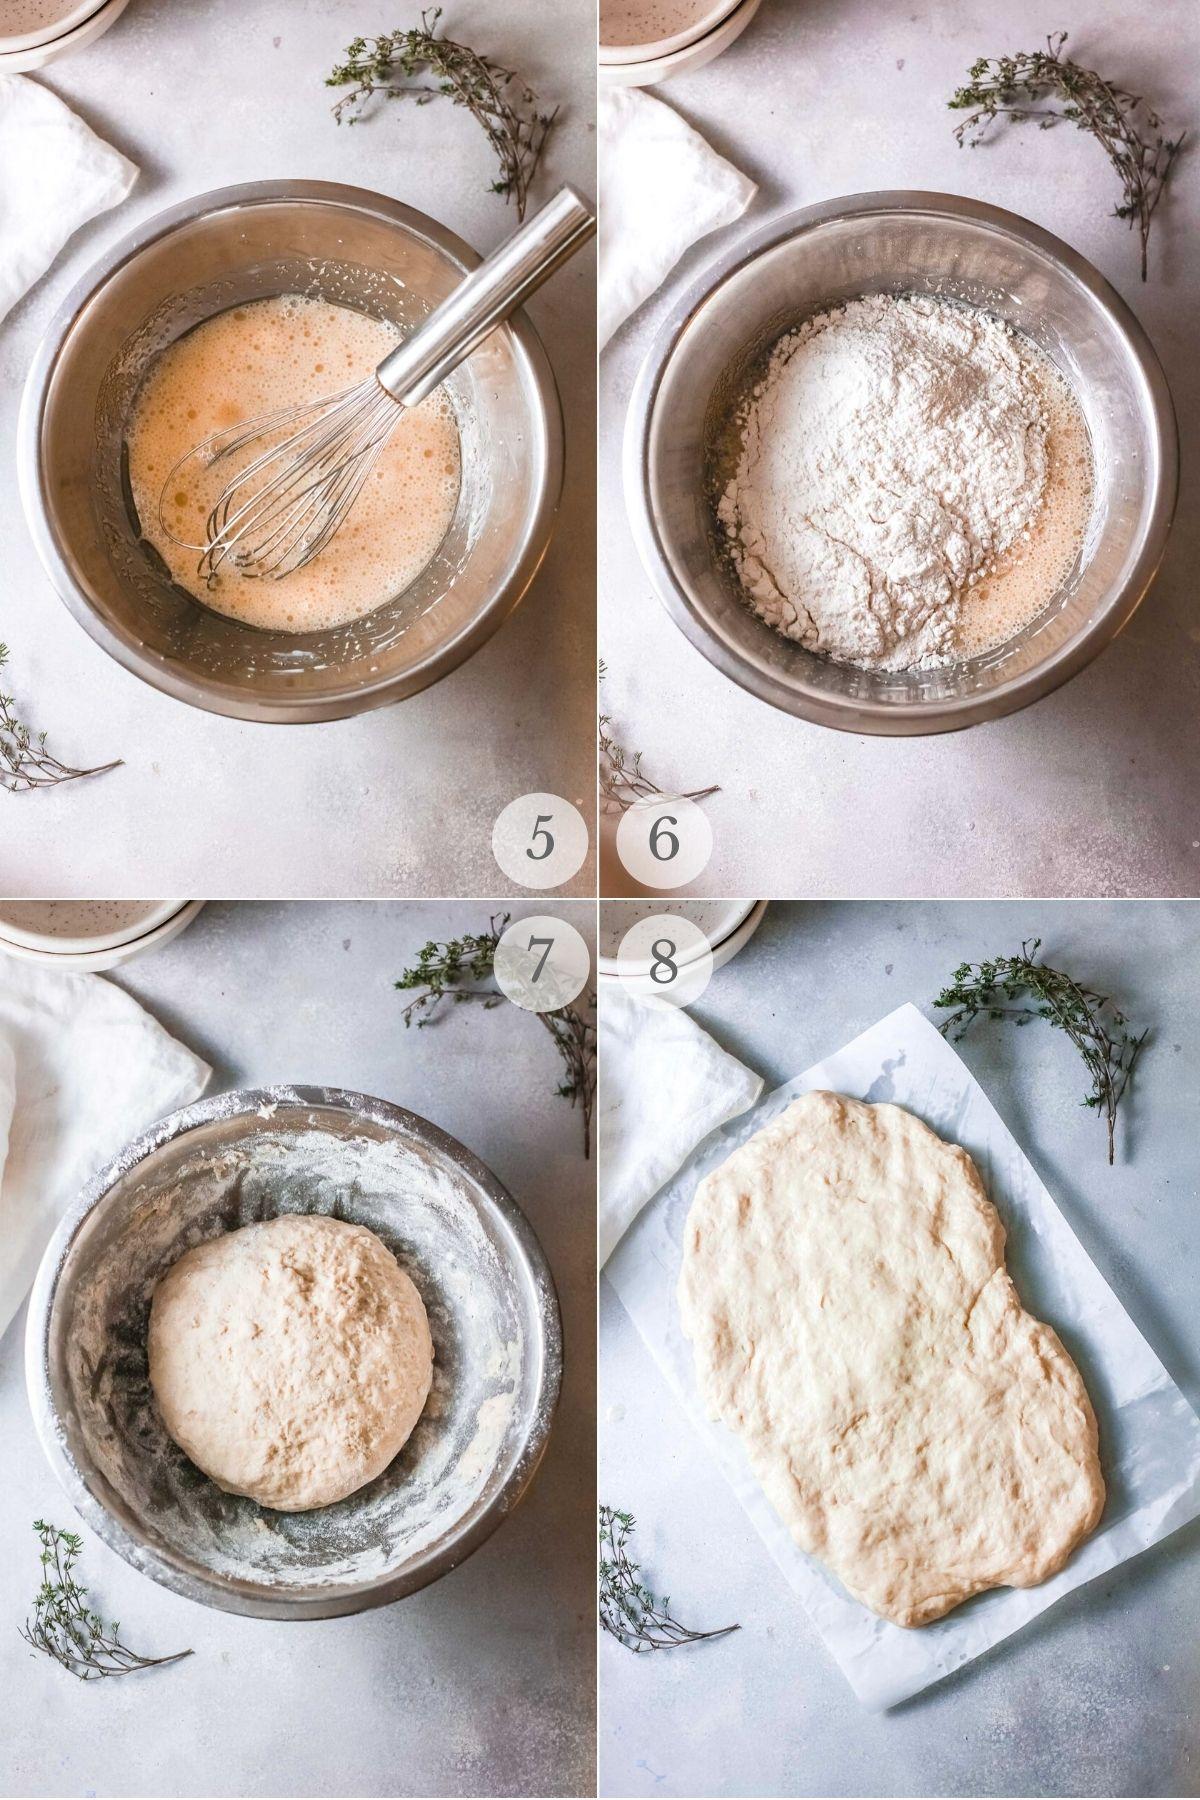 garlic bread recipe steps 5-8